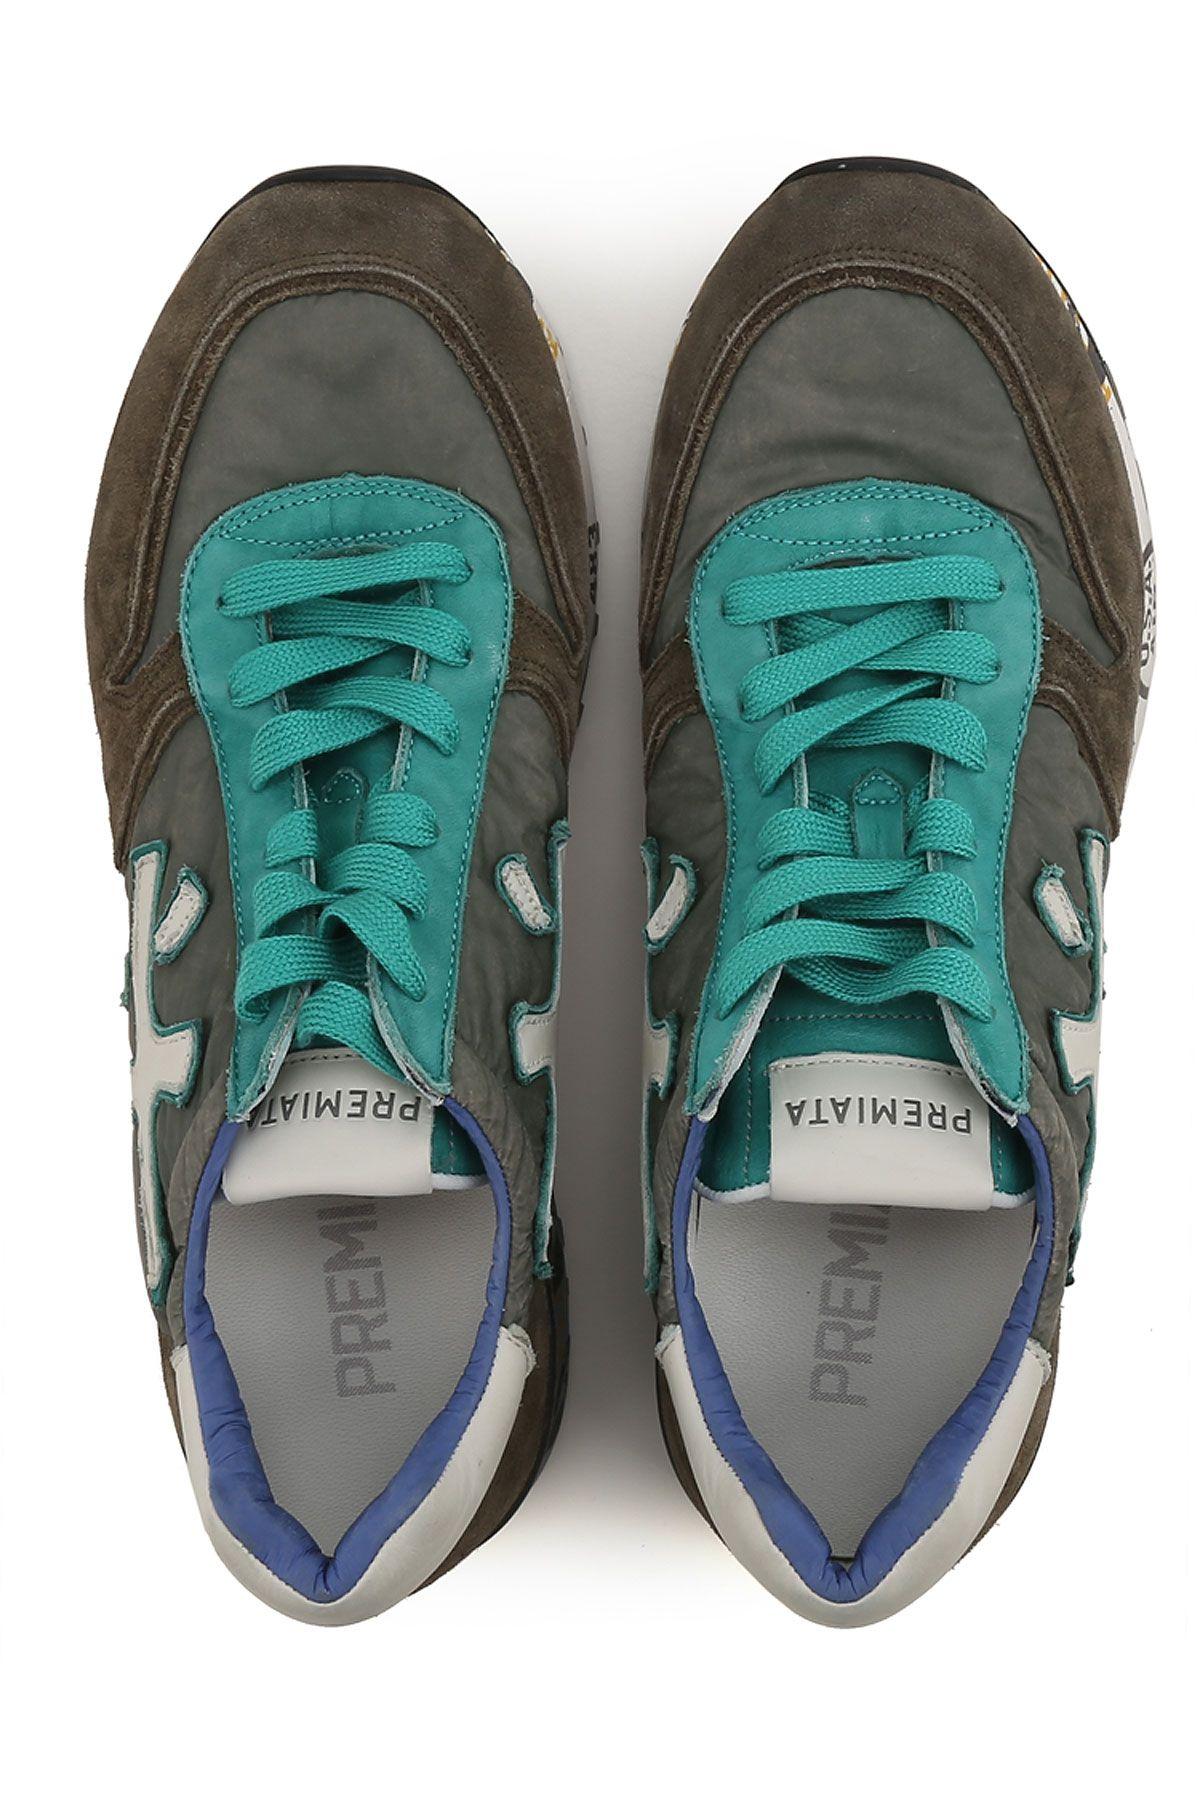 PREMIATA Chaussures Homme Premiata sneakers, Mens